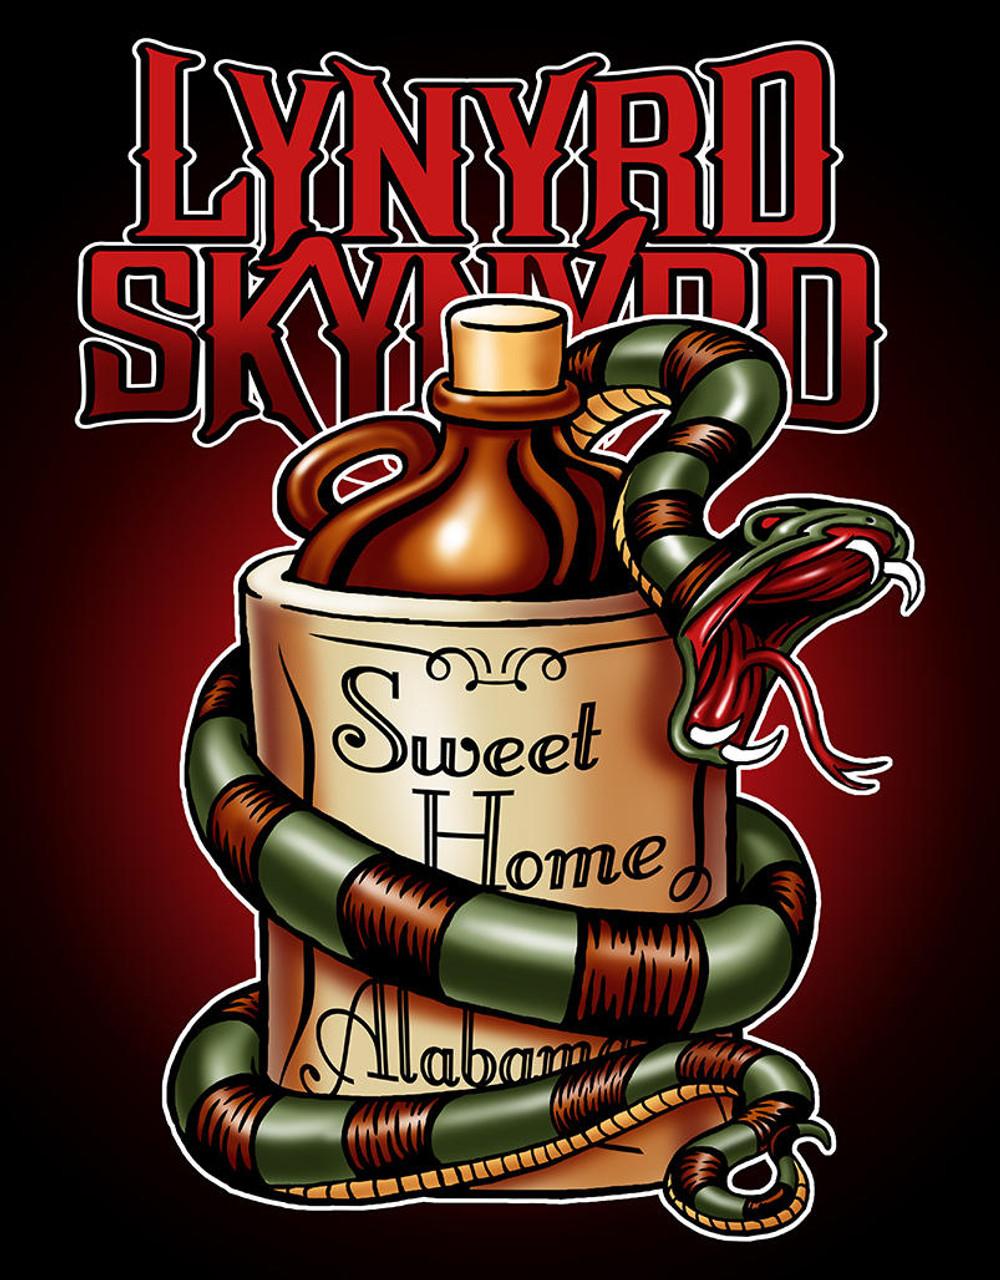 Skynyrd - Sweet Home